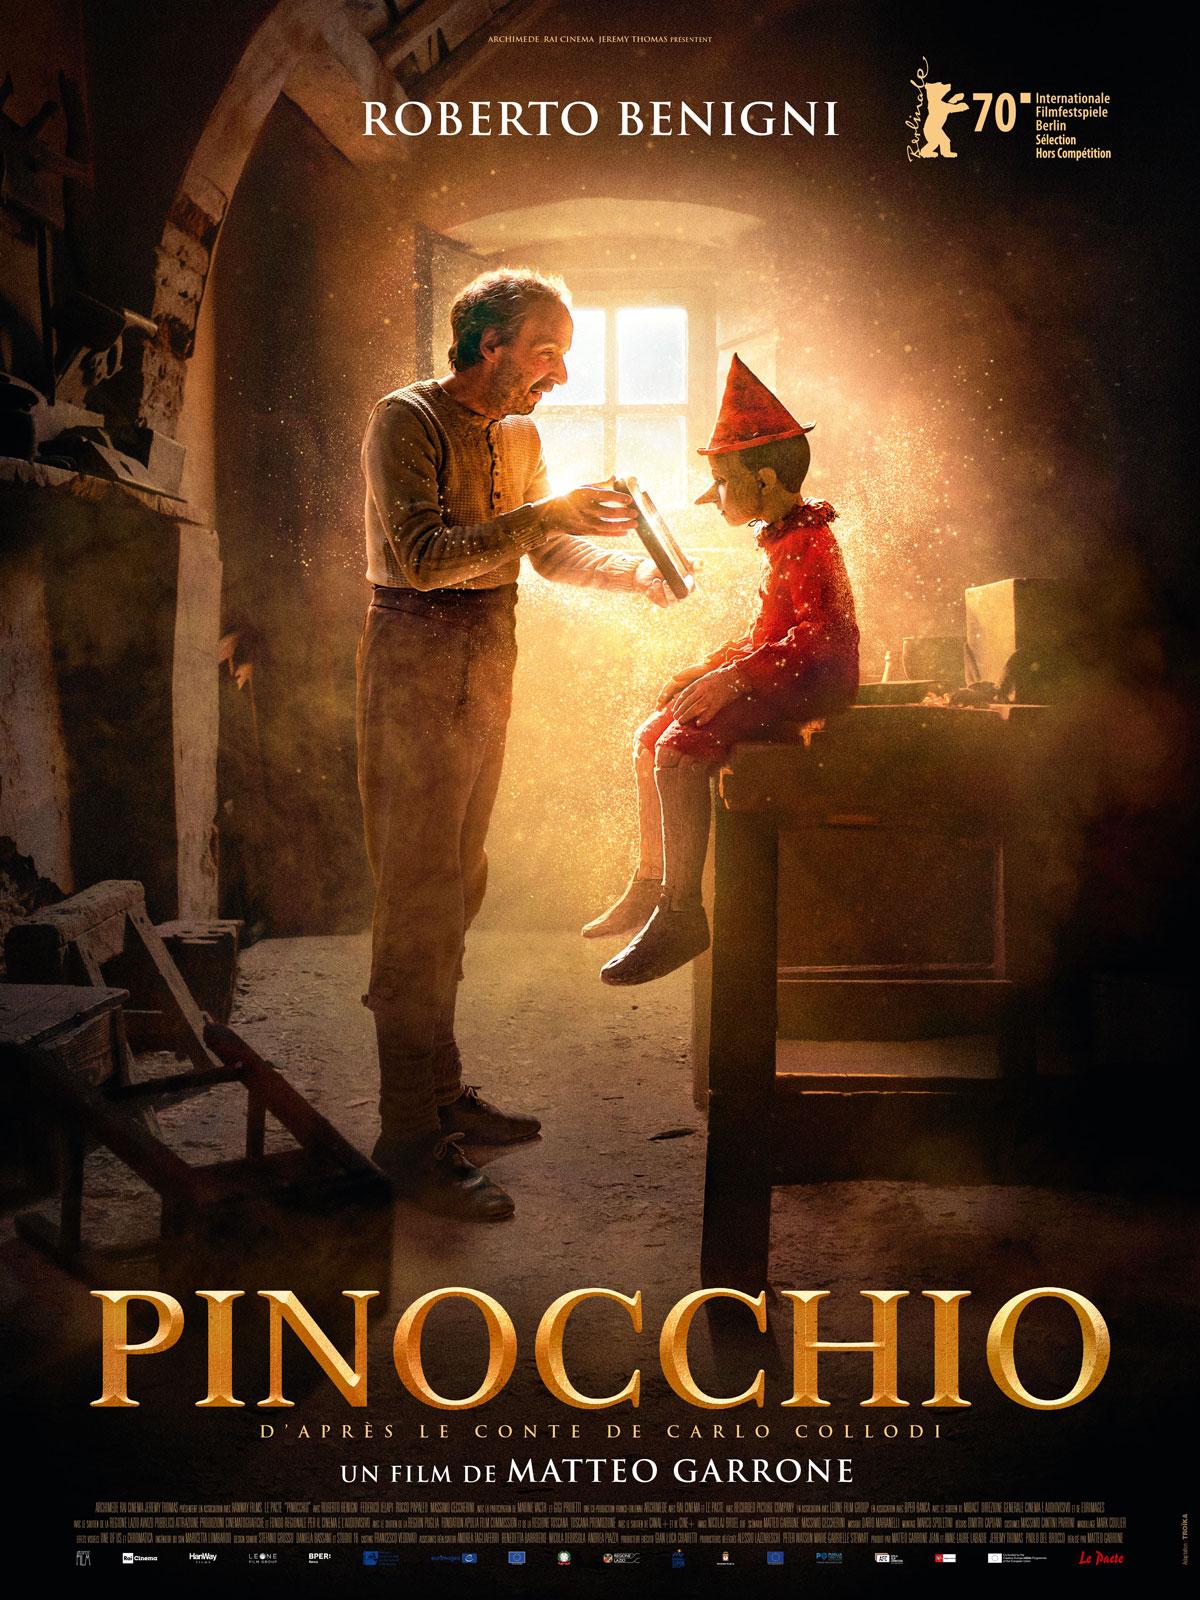 """Пиноккио"", Италия-Франция-Великобритания, 2019, Recorded Picture Company, режиссёр Маттео Гарроне, авторы сценария Маттео Гарроне и Массимо Чеккерини, композитор Дарио Марианелли"